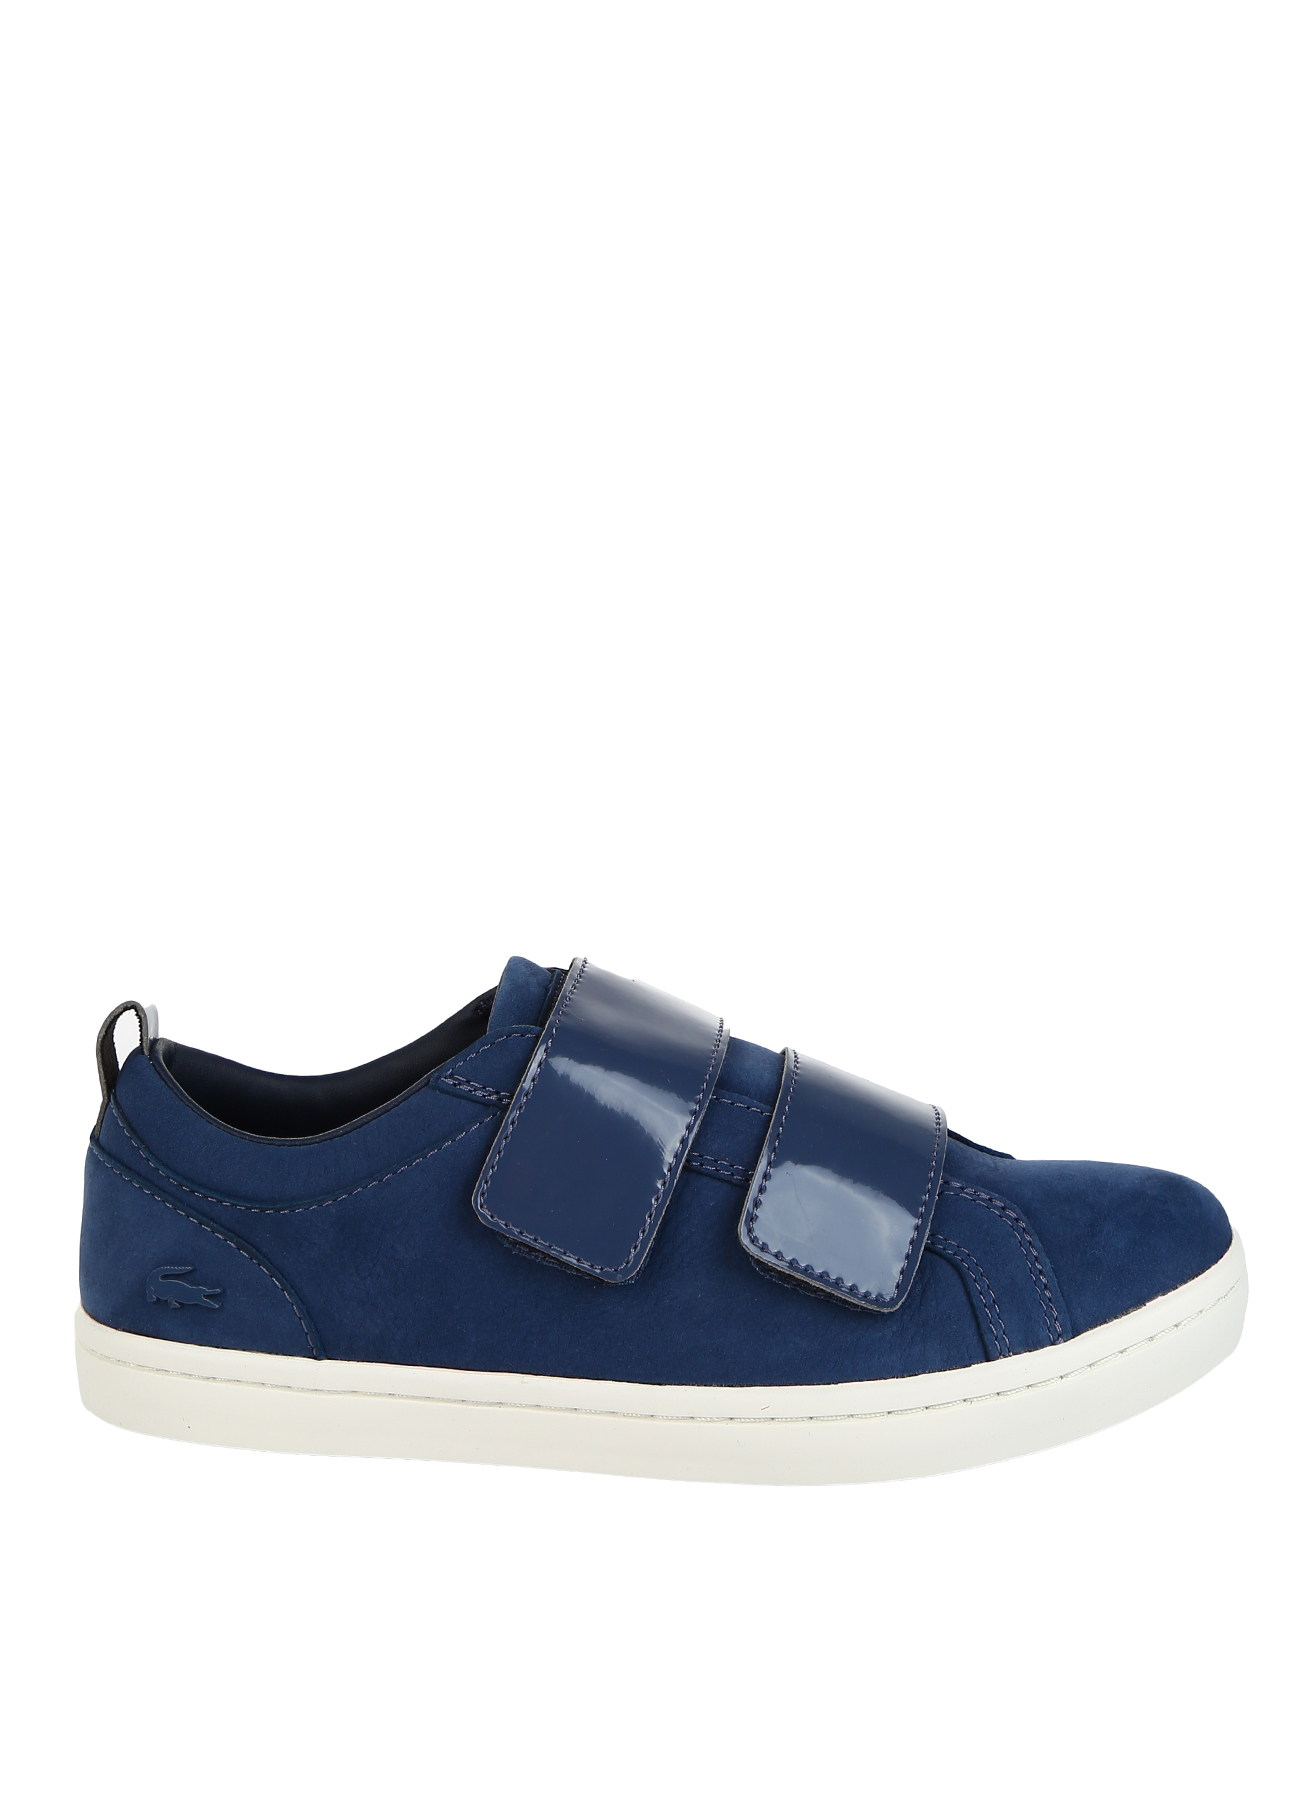 Lacoste Sneaker 38 5002312554003 Ürün Resmi